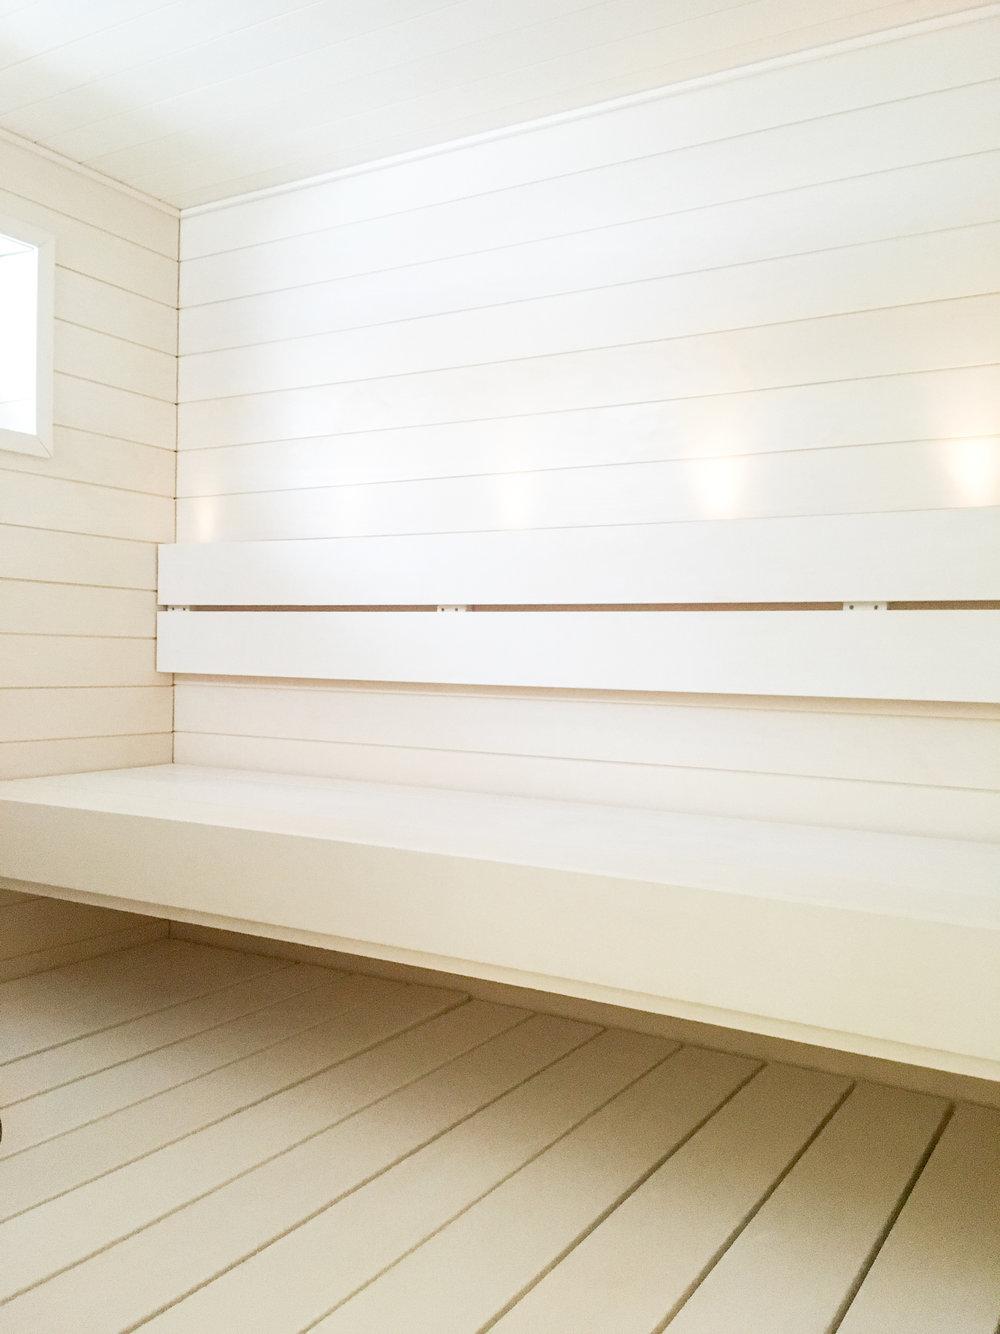 kylpyhuonejasauna2.jpg